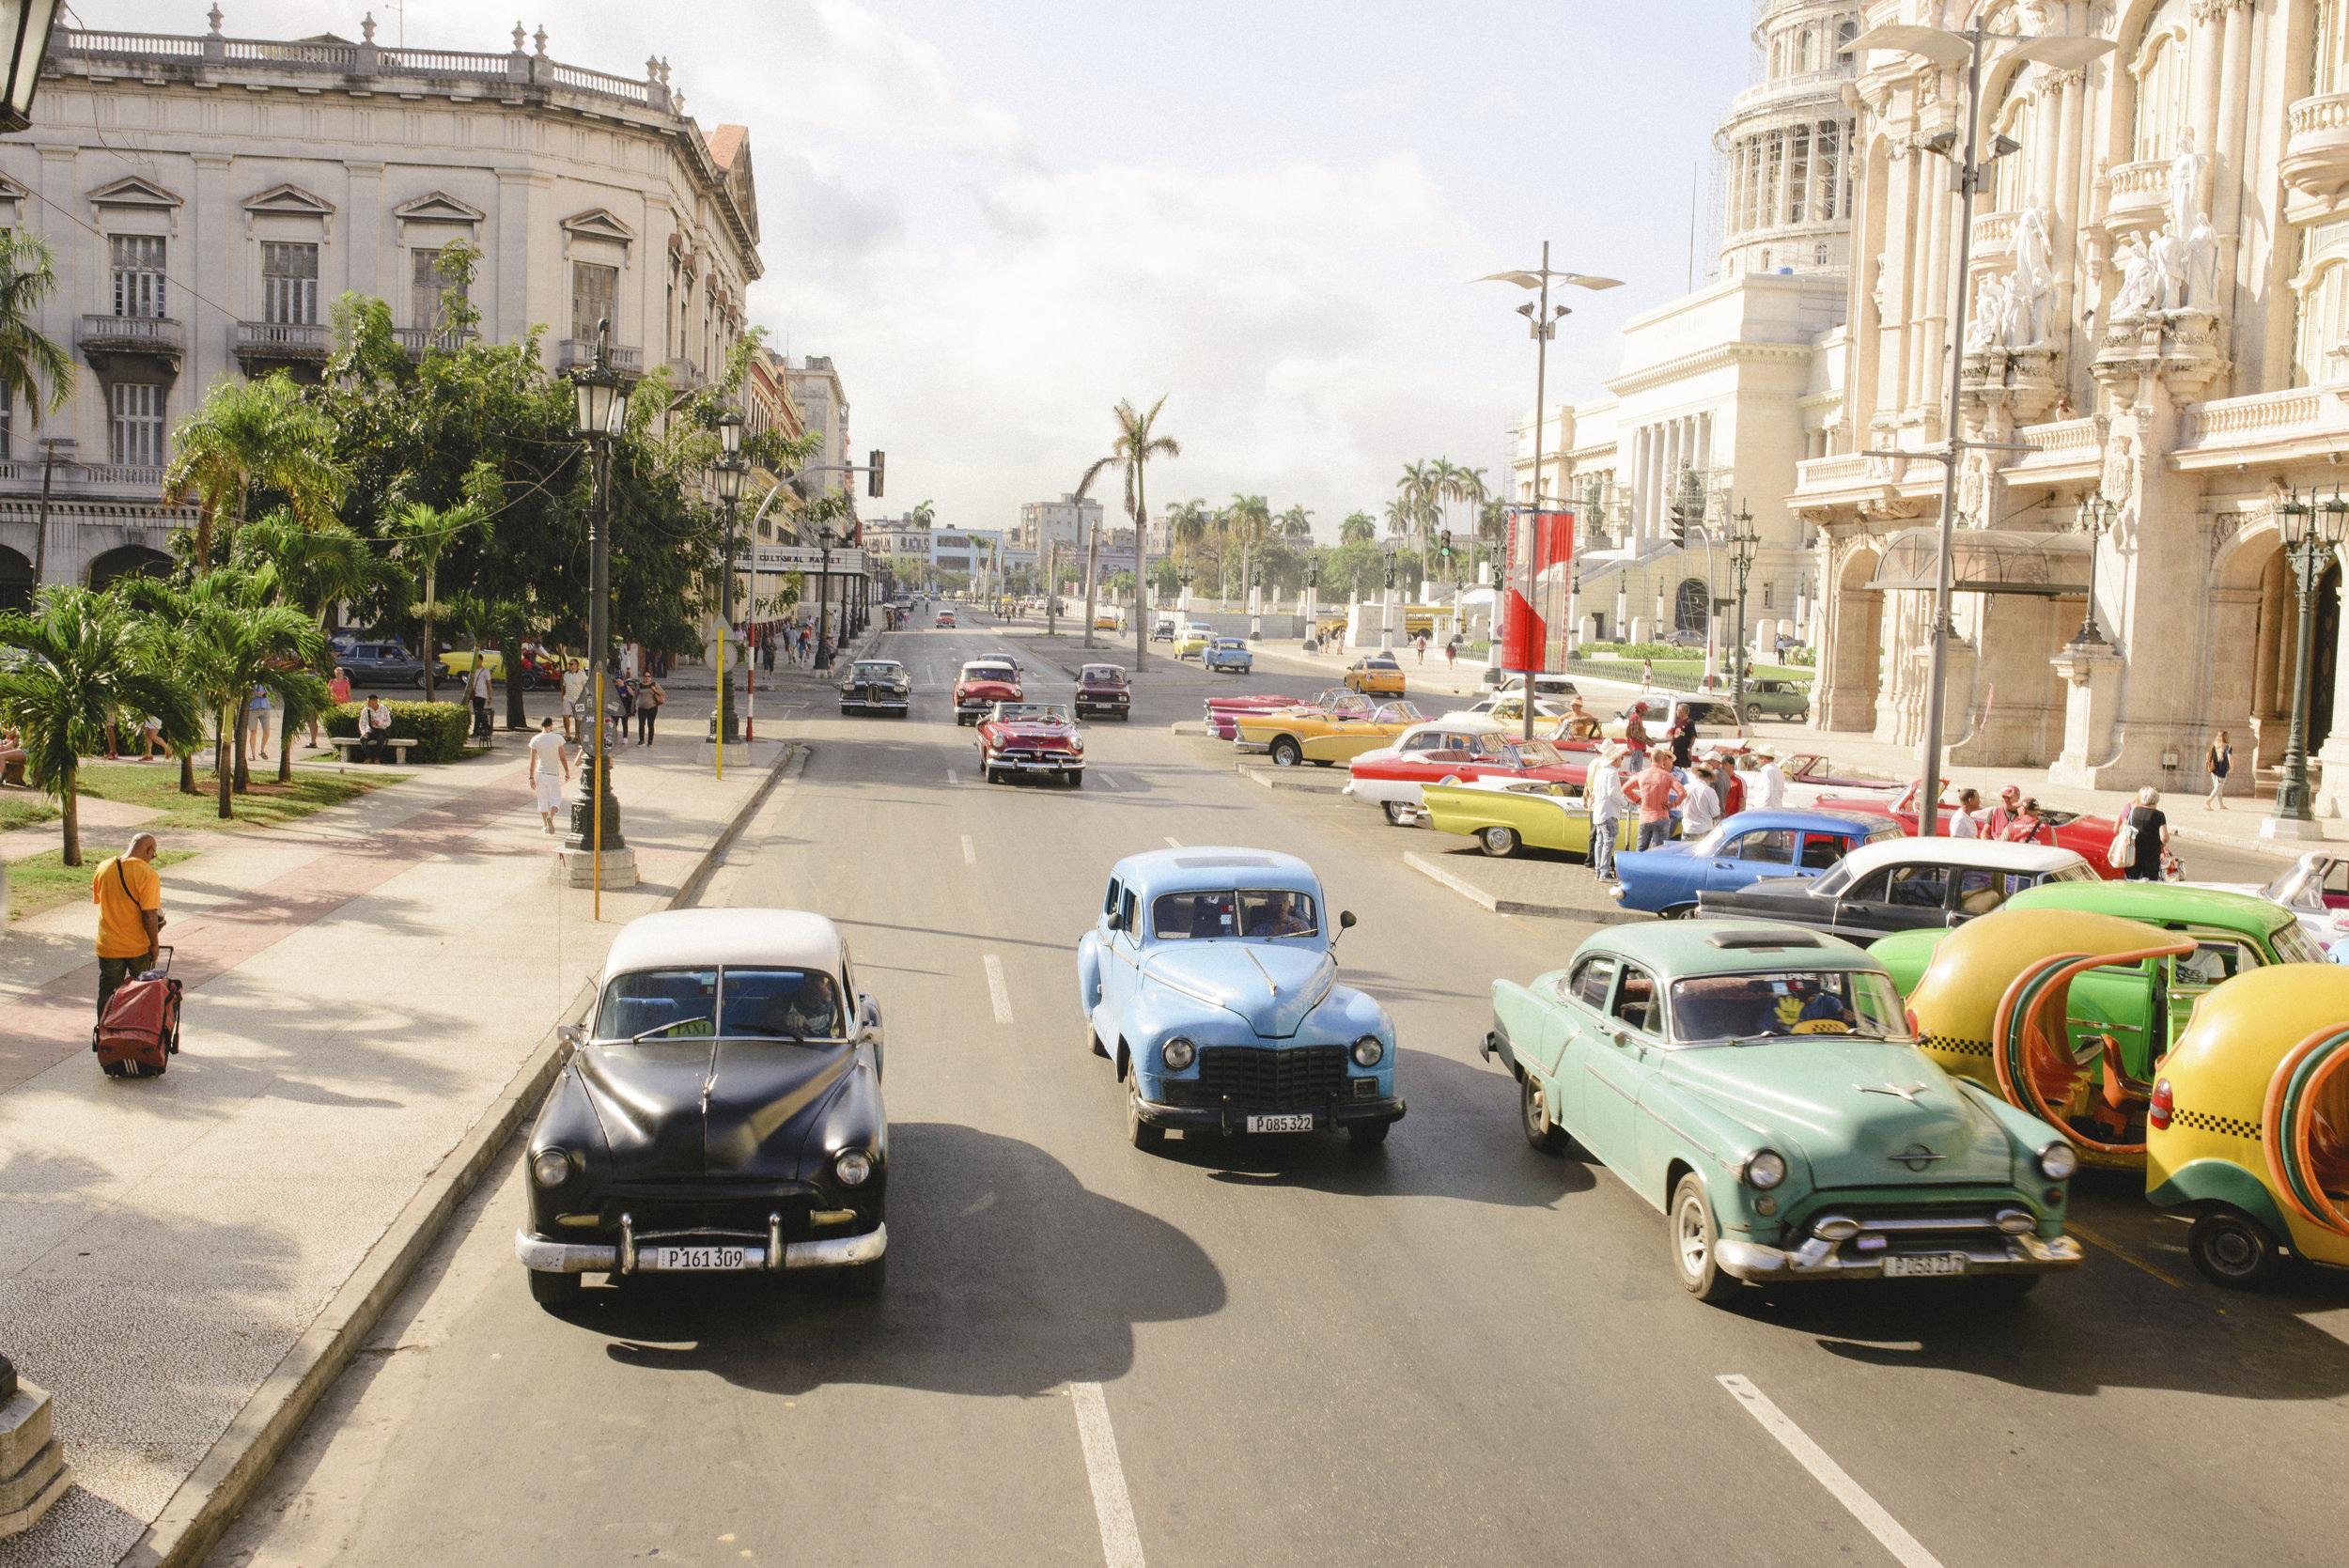 Cuba's iconic classic cars in Old Havana